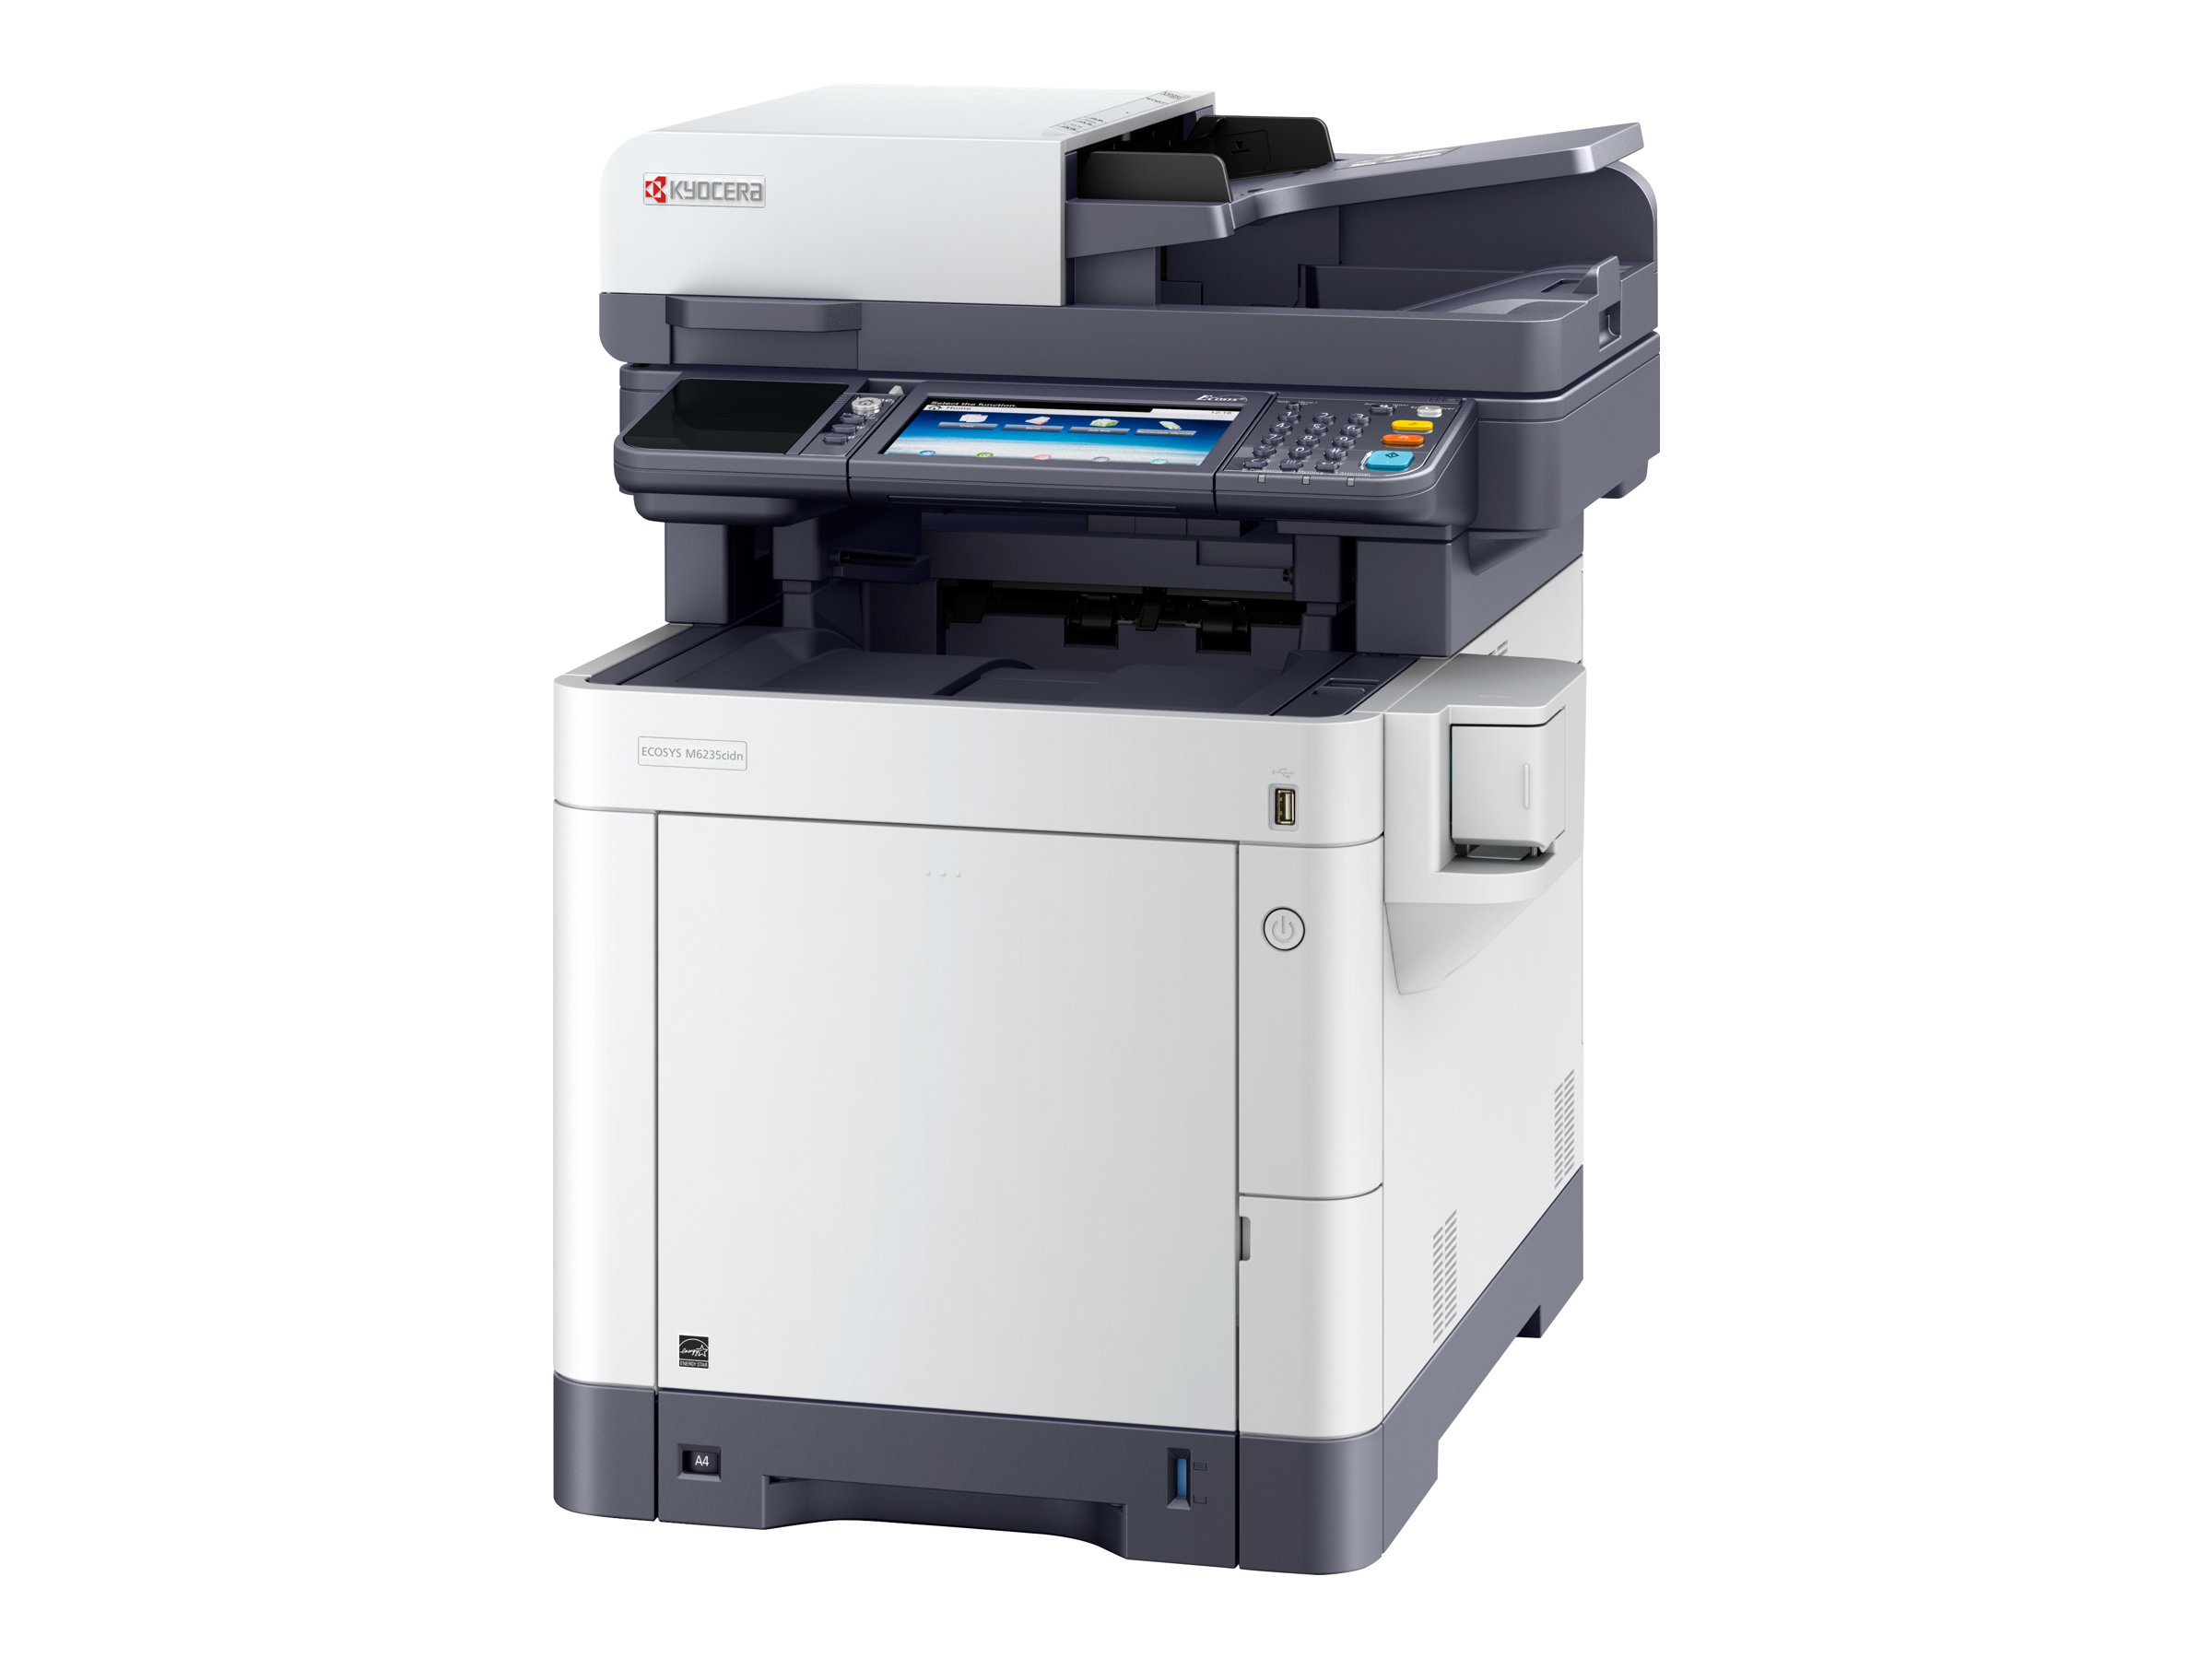 Kyocera ECOSYS M6235cidn - Multifunktionsdrucker - Farbe - Laser - Legal (216 x 356 mm)/A4 (210 x 297 mm) (Original) - A4/Legal